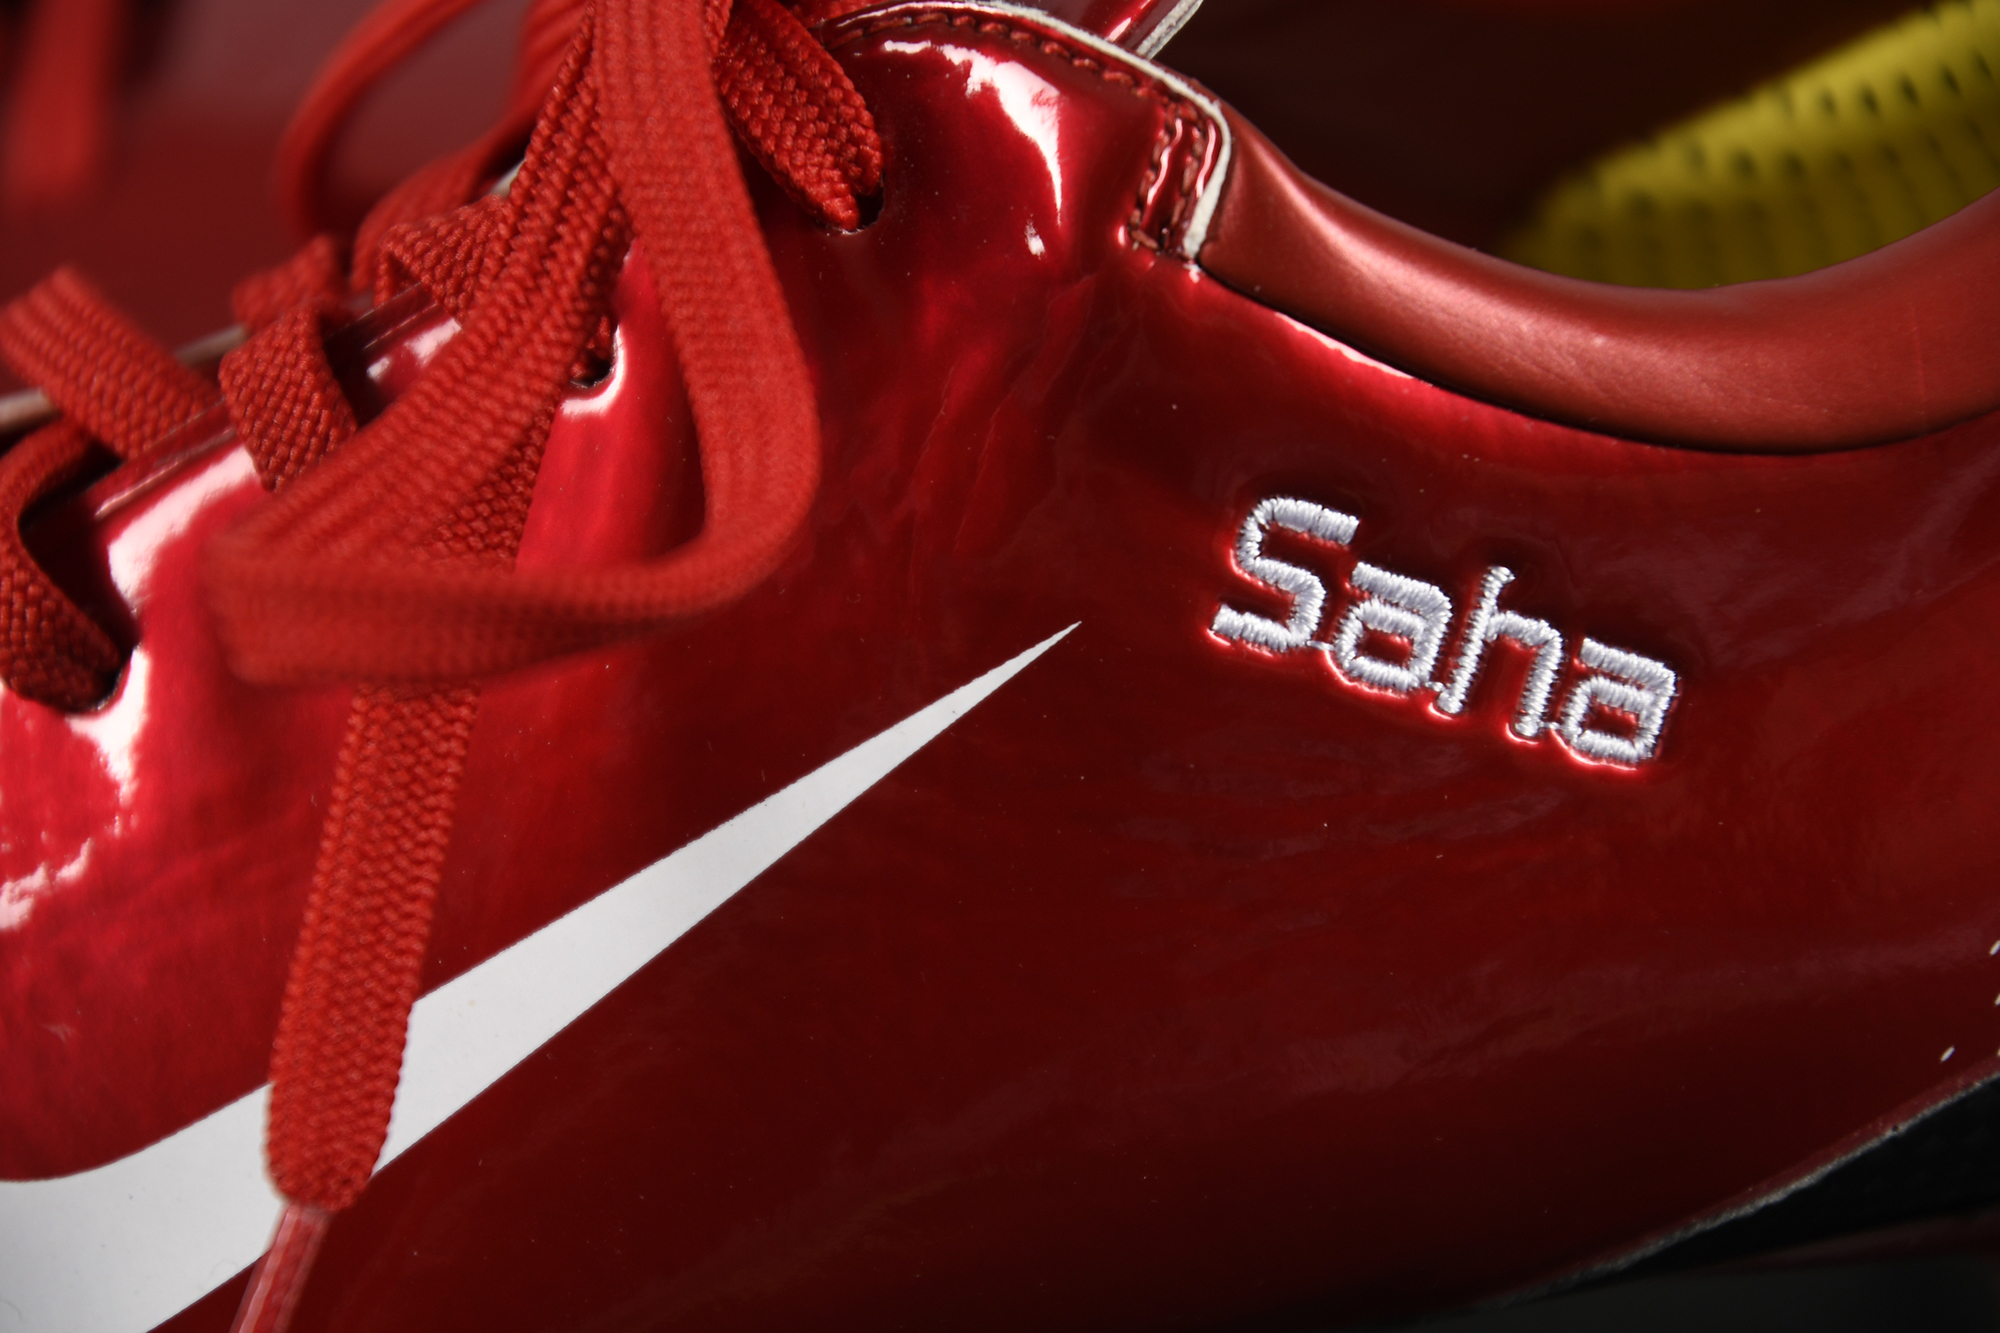 LOUIS SAHA Personalised Football Boots - Image 3 of 5